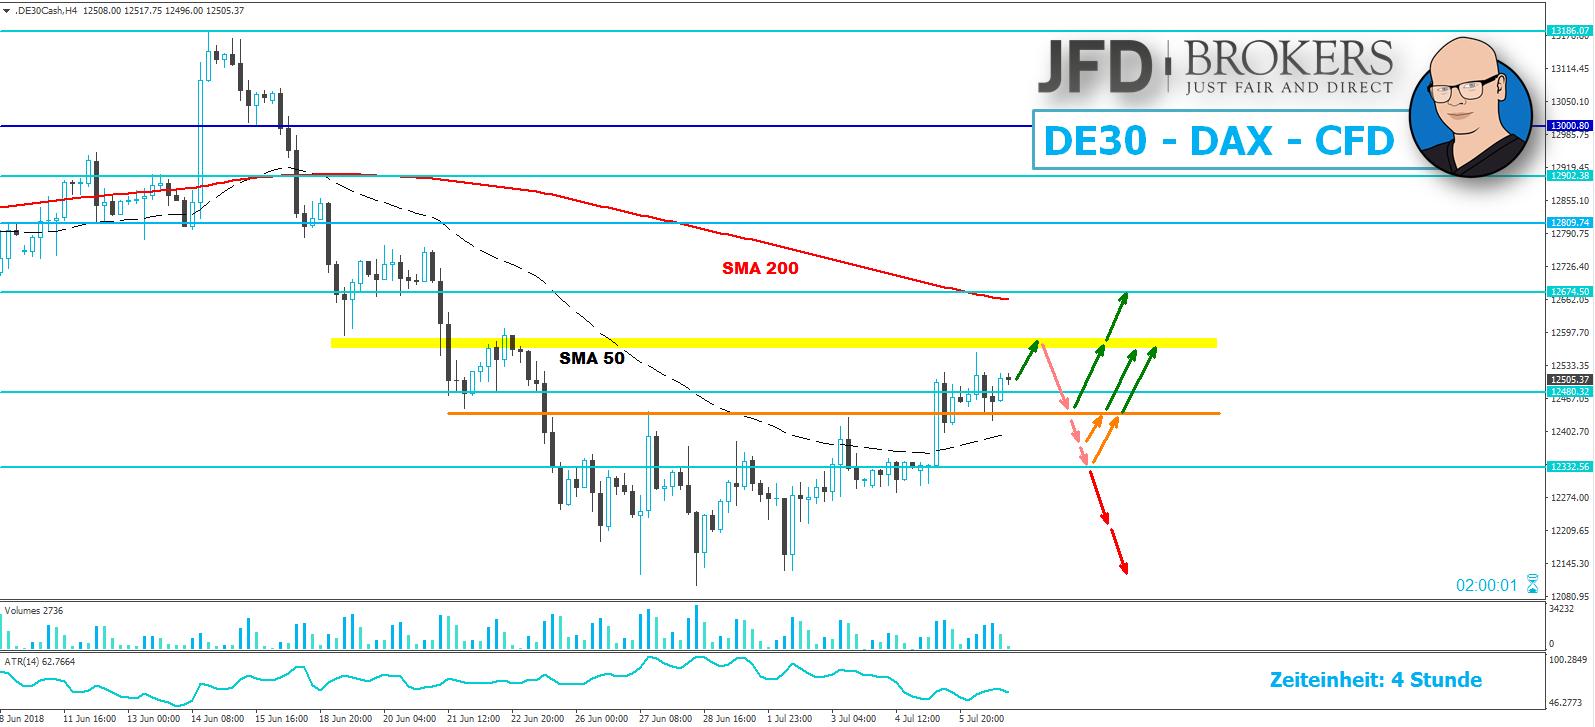 JFD-Wochenausblick-EUR-USD-GBP-USD-DAX-und-WTI-09-07-2018-13-07-2018-Kommentar-JFD-Brokers-GodmodeTrader.de-3